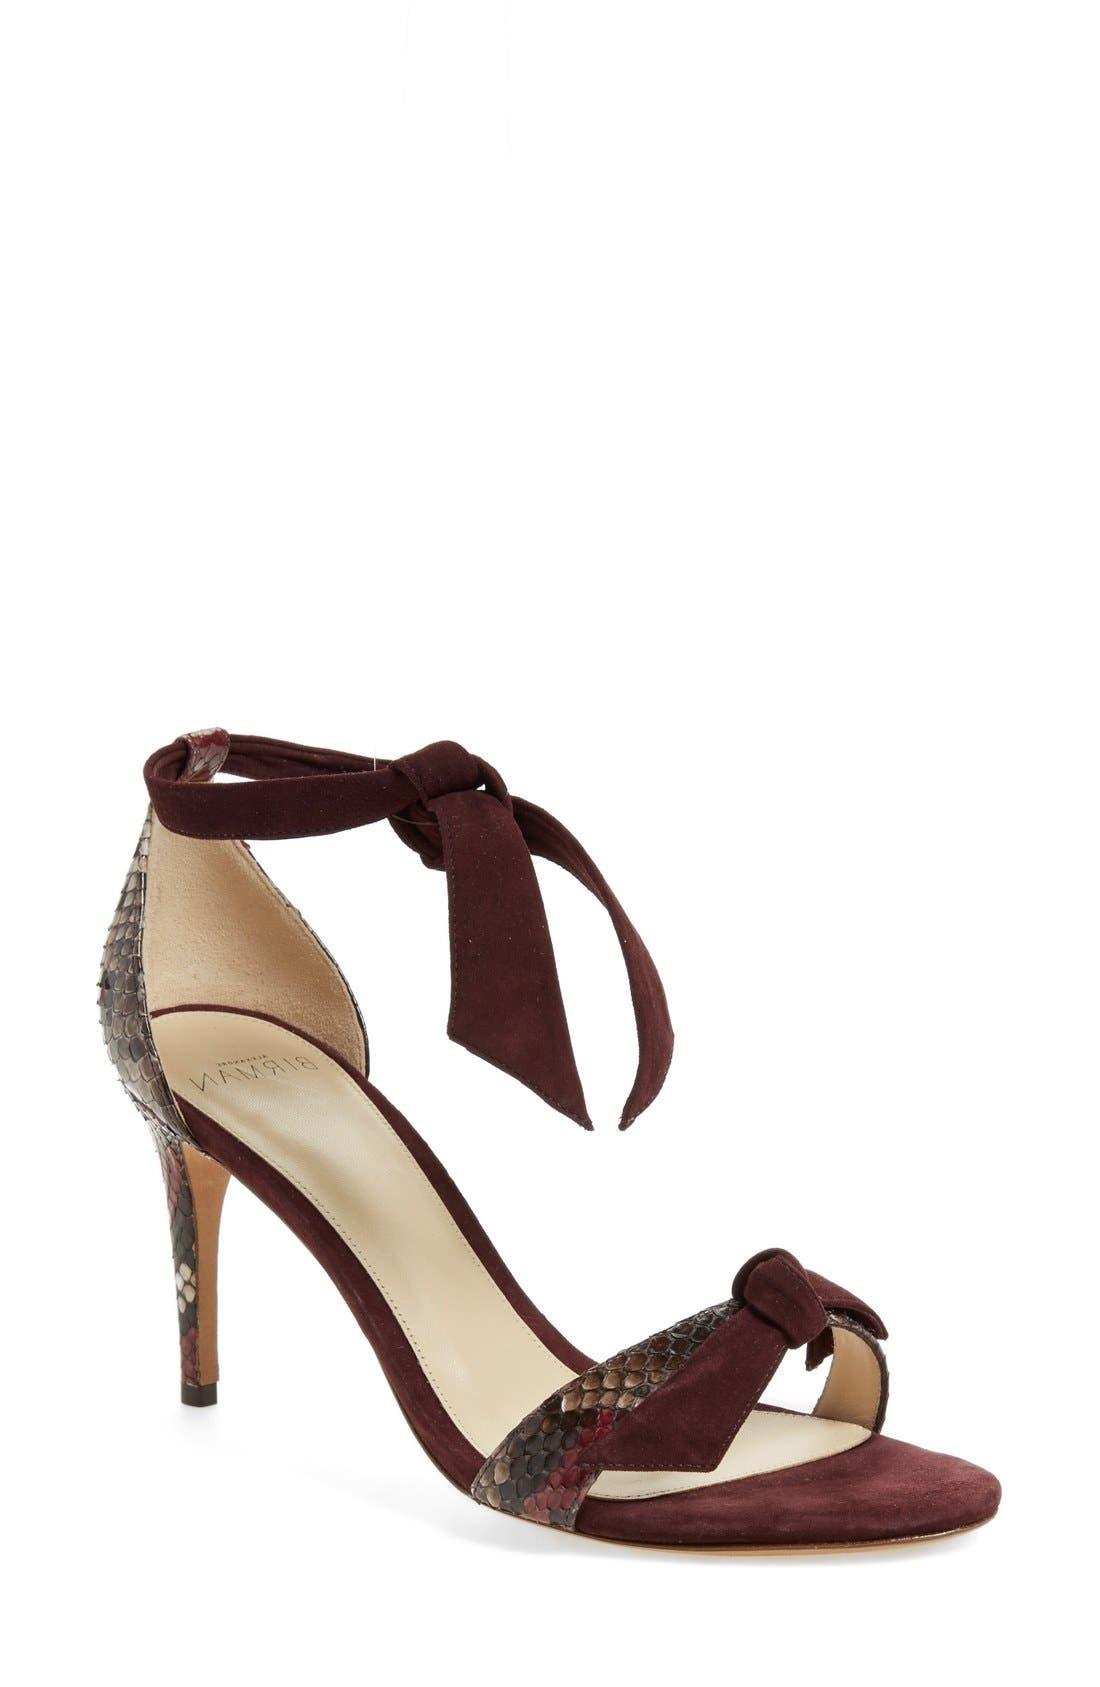 'Clarita' Suede & Genuine Python Ankle Tie Sandal,                         Main,                         color, 930